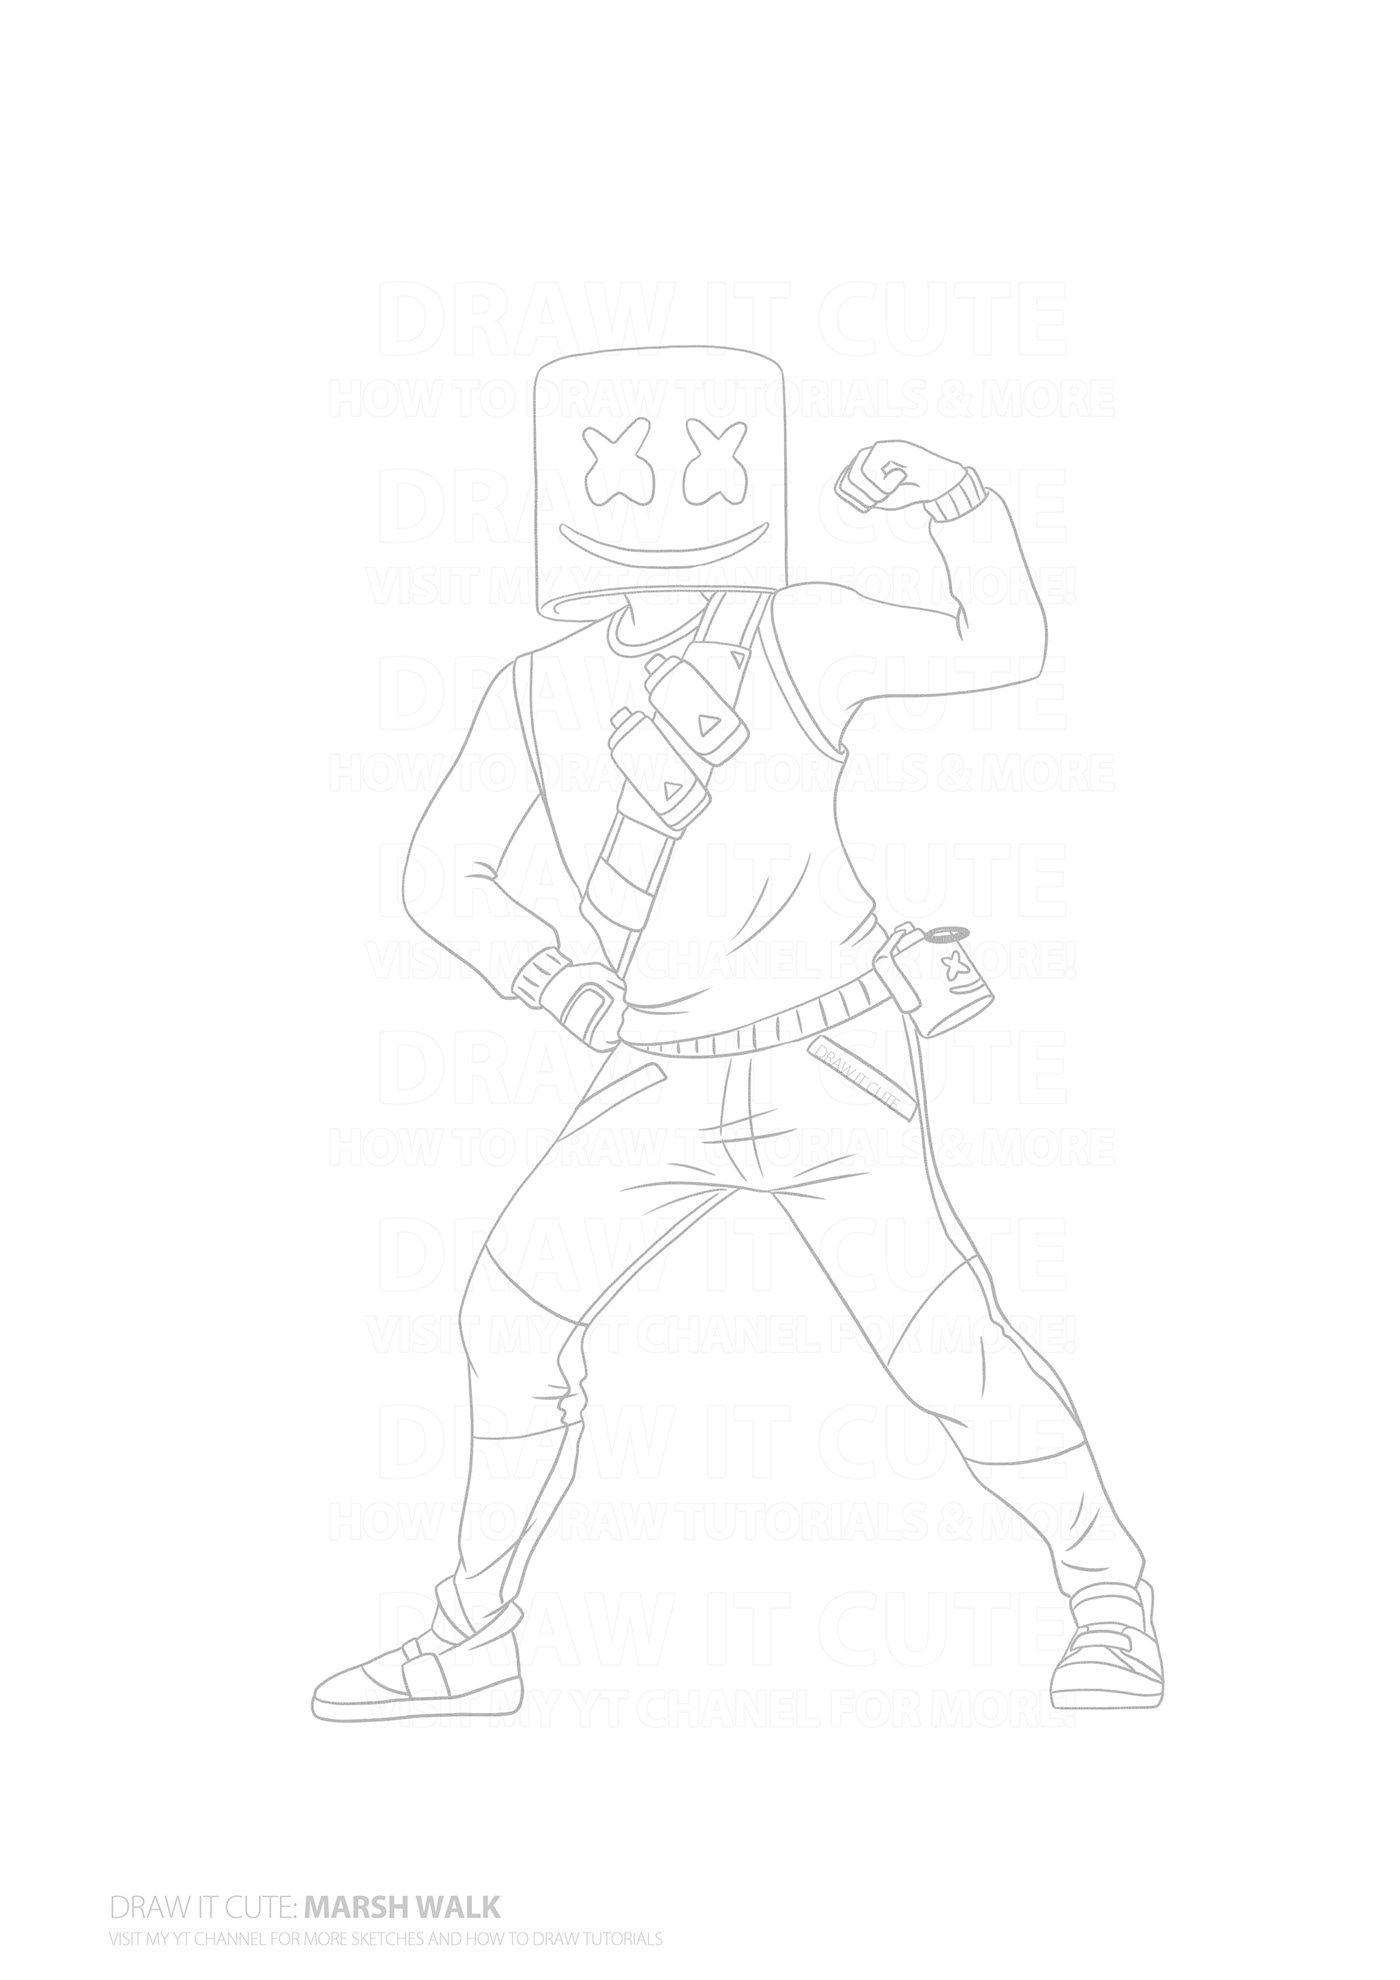 How to draw Marsh Walk | Fortnite Season 7 Drawing Tuto on ...